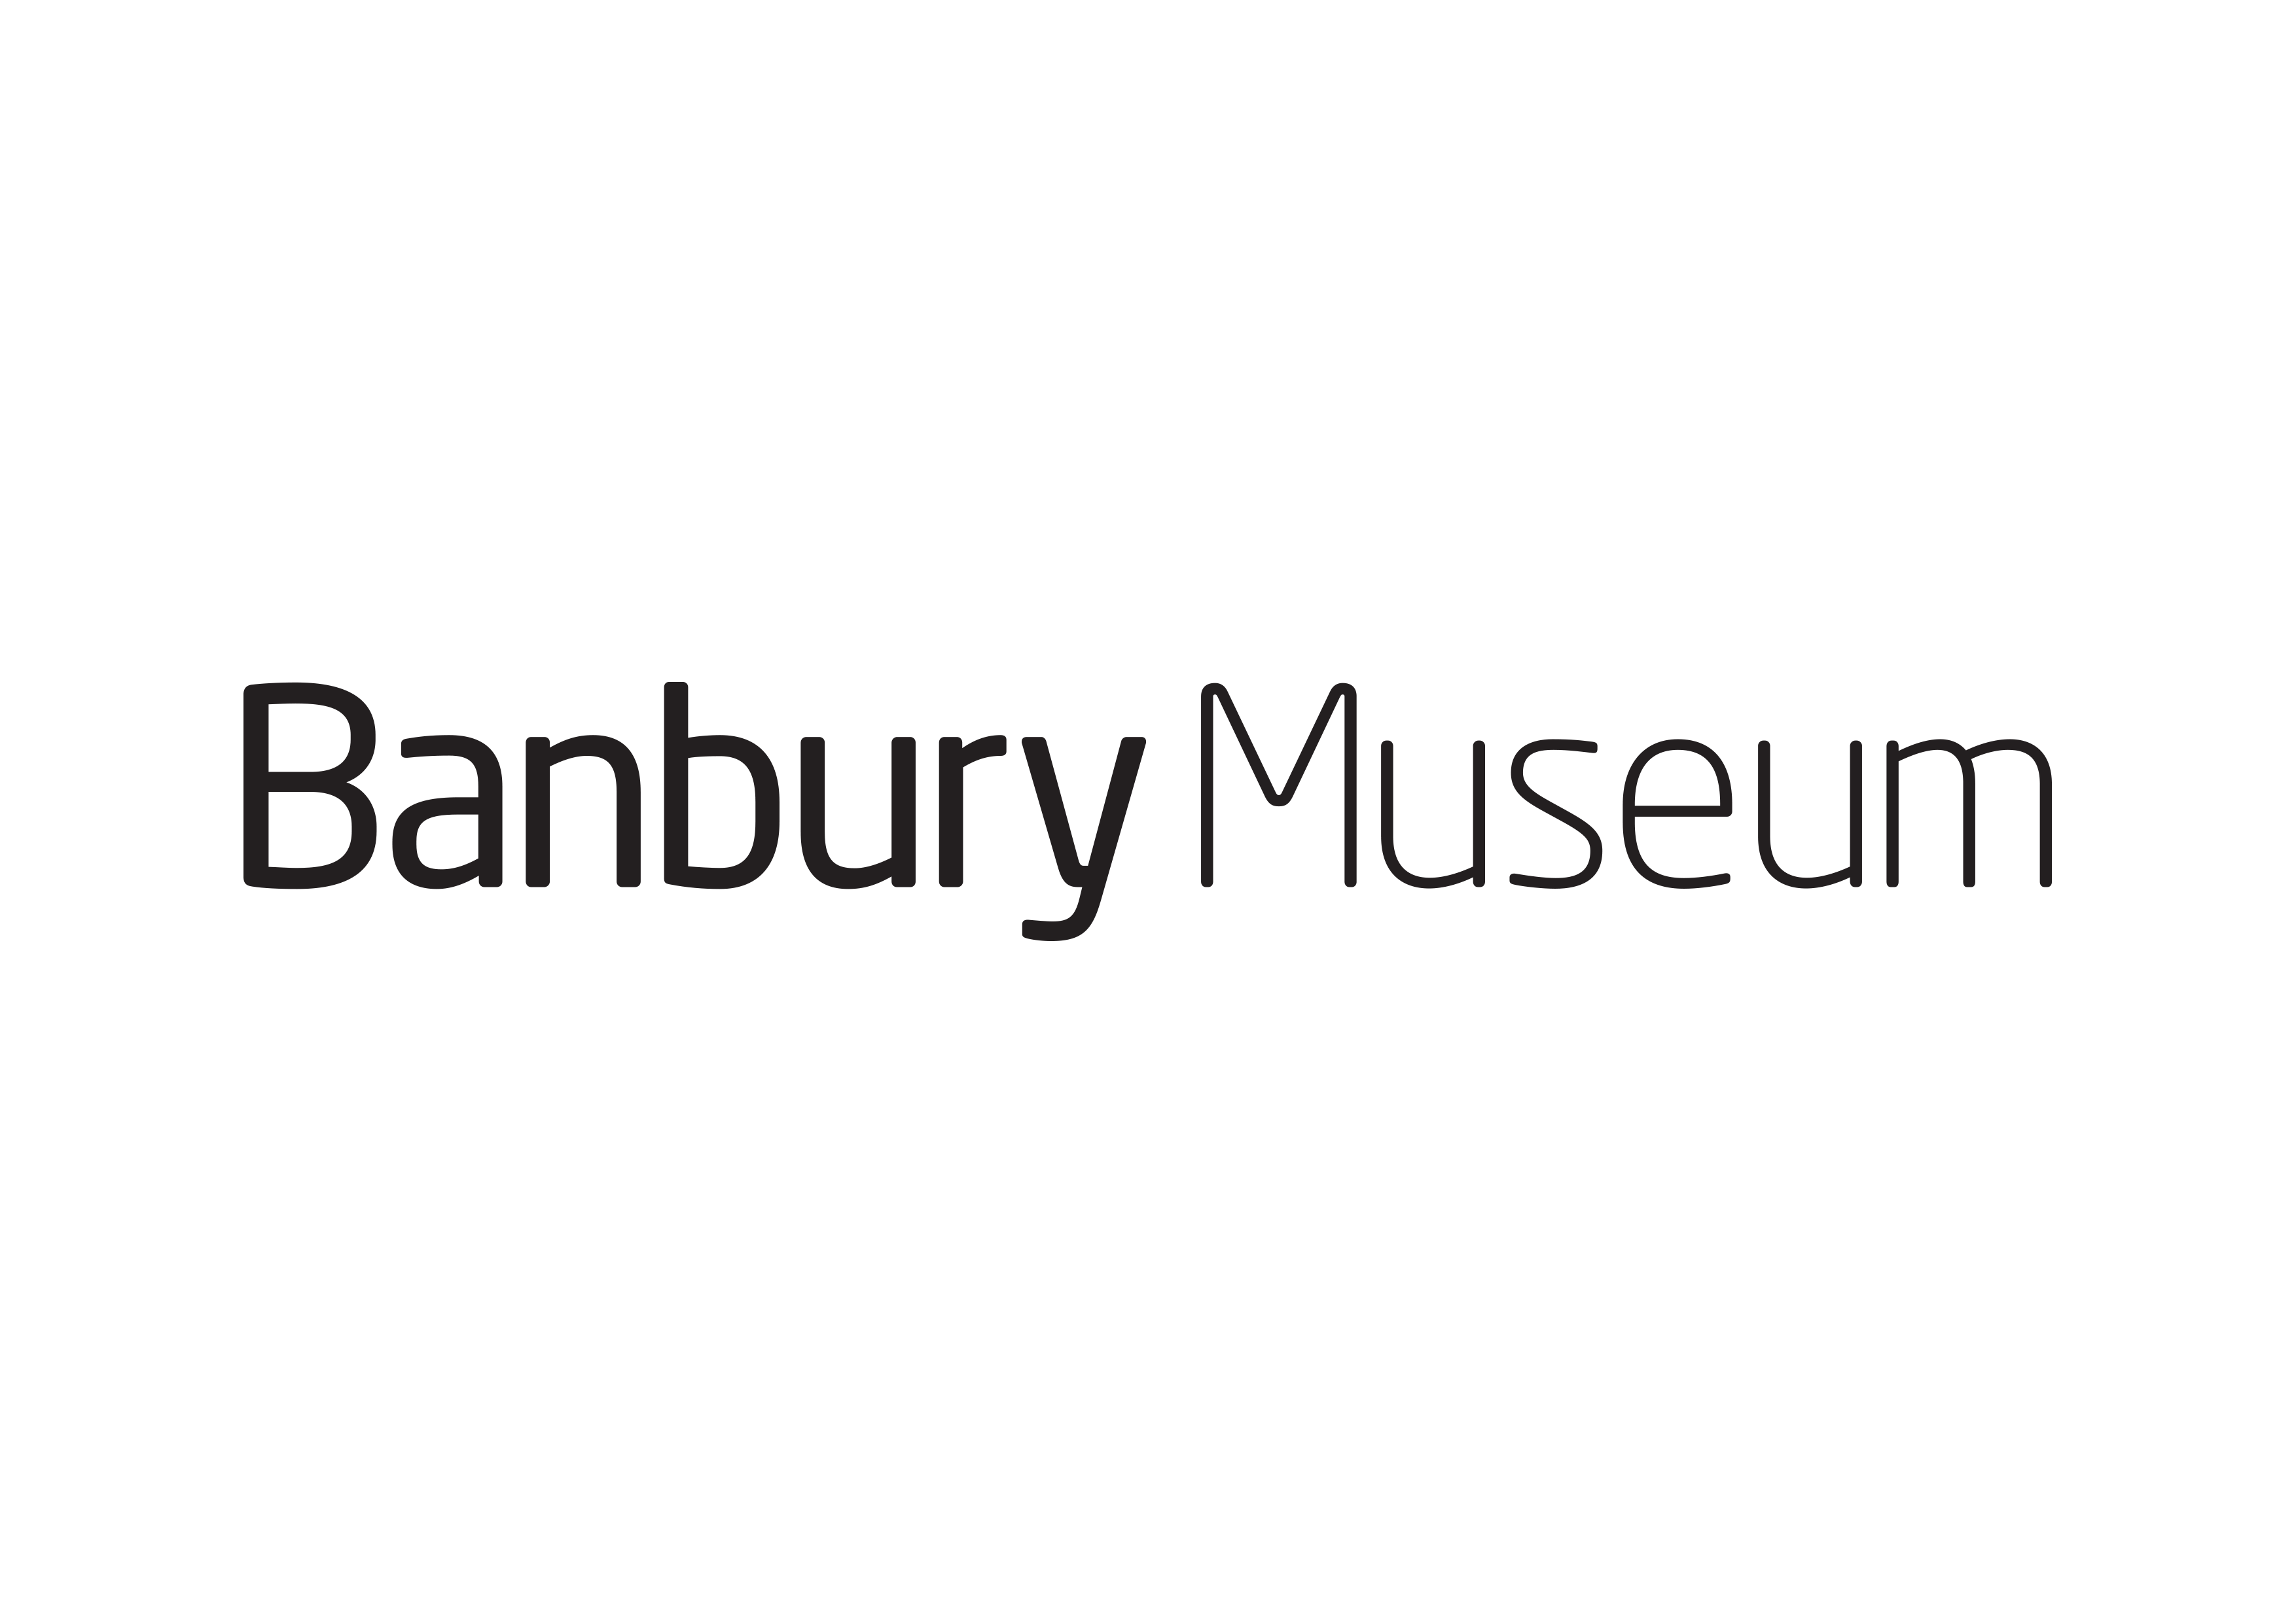 Banbury Museum's logo